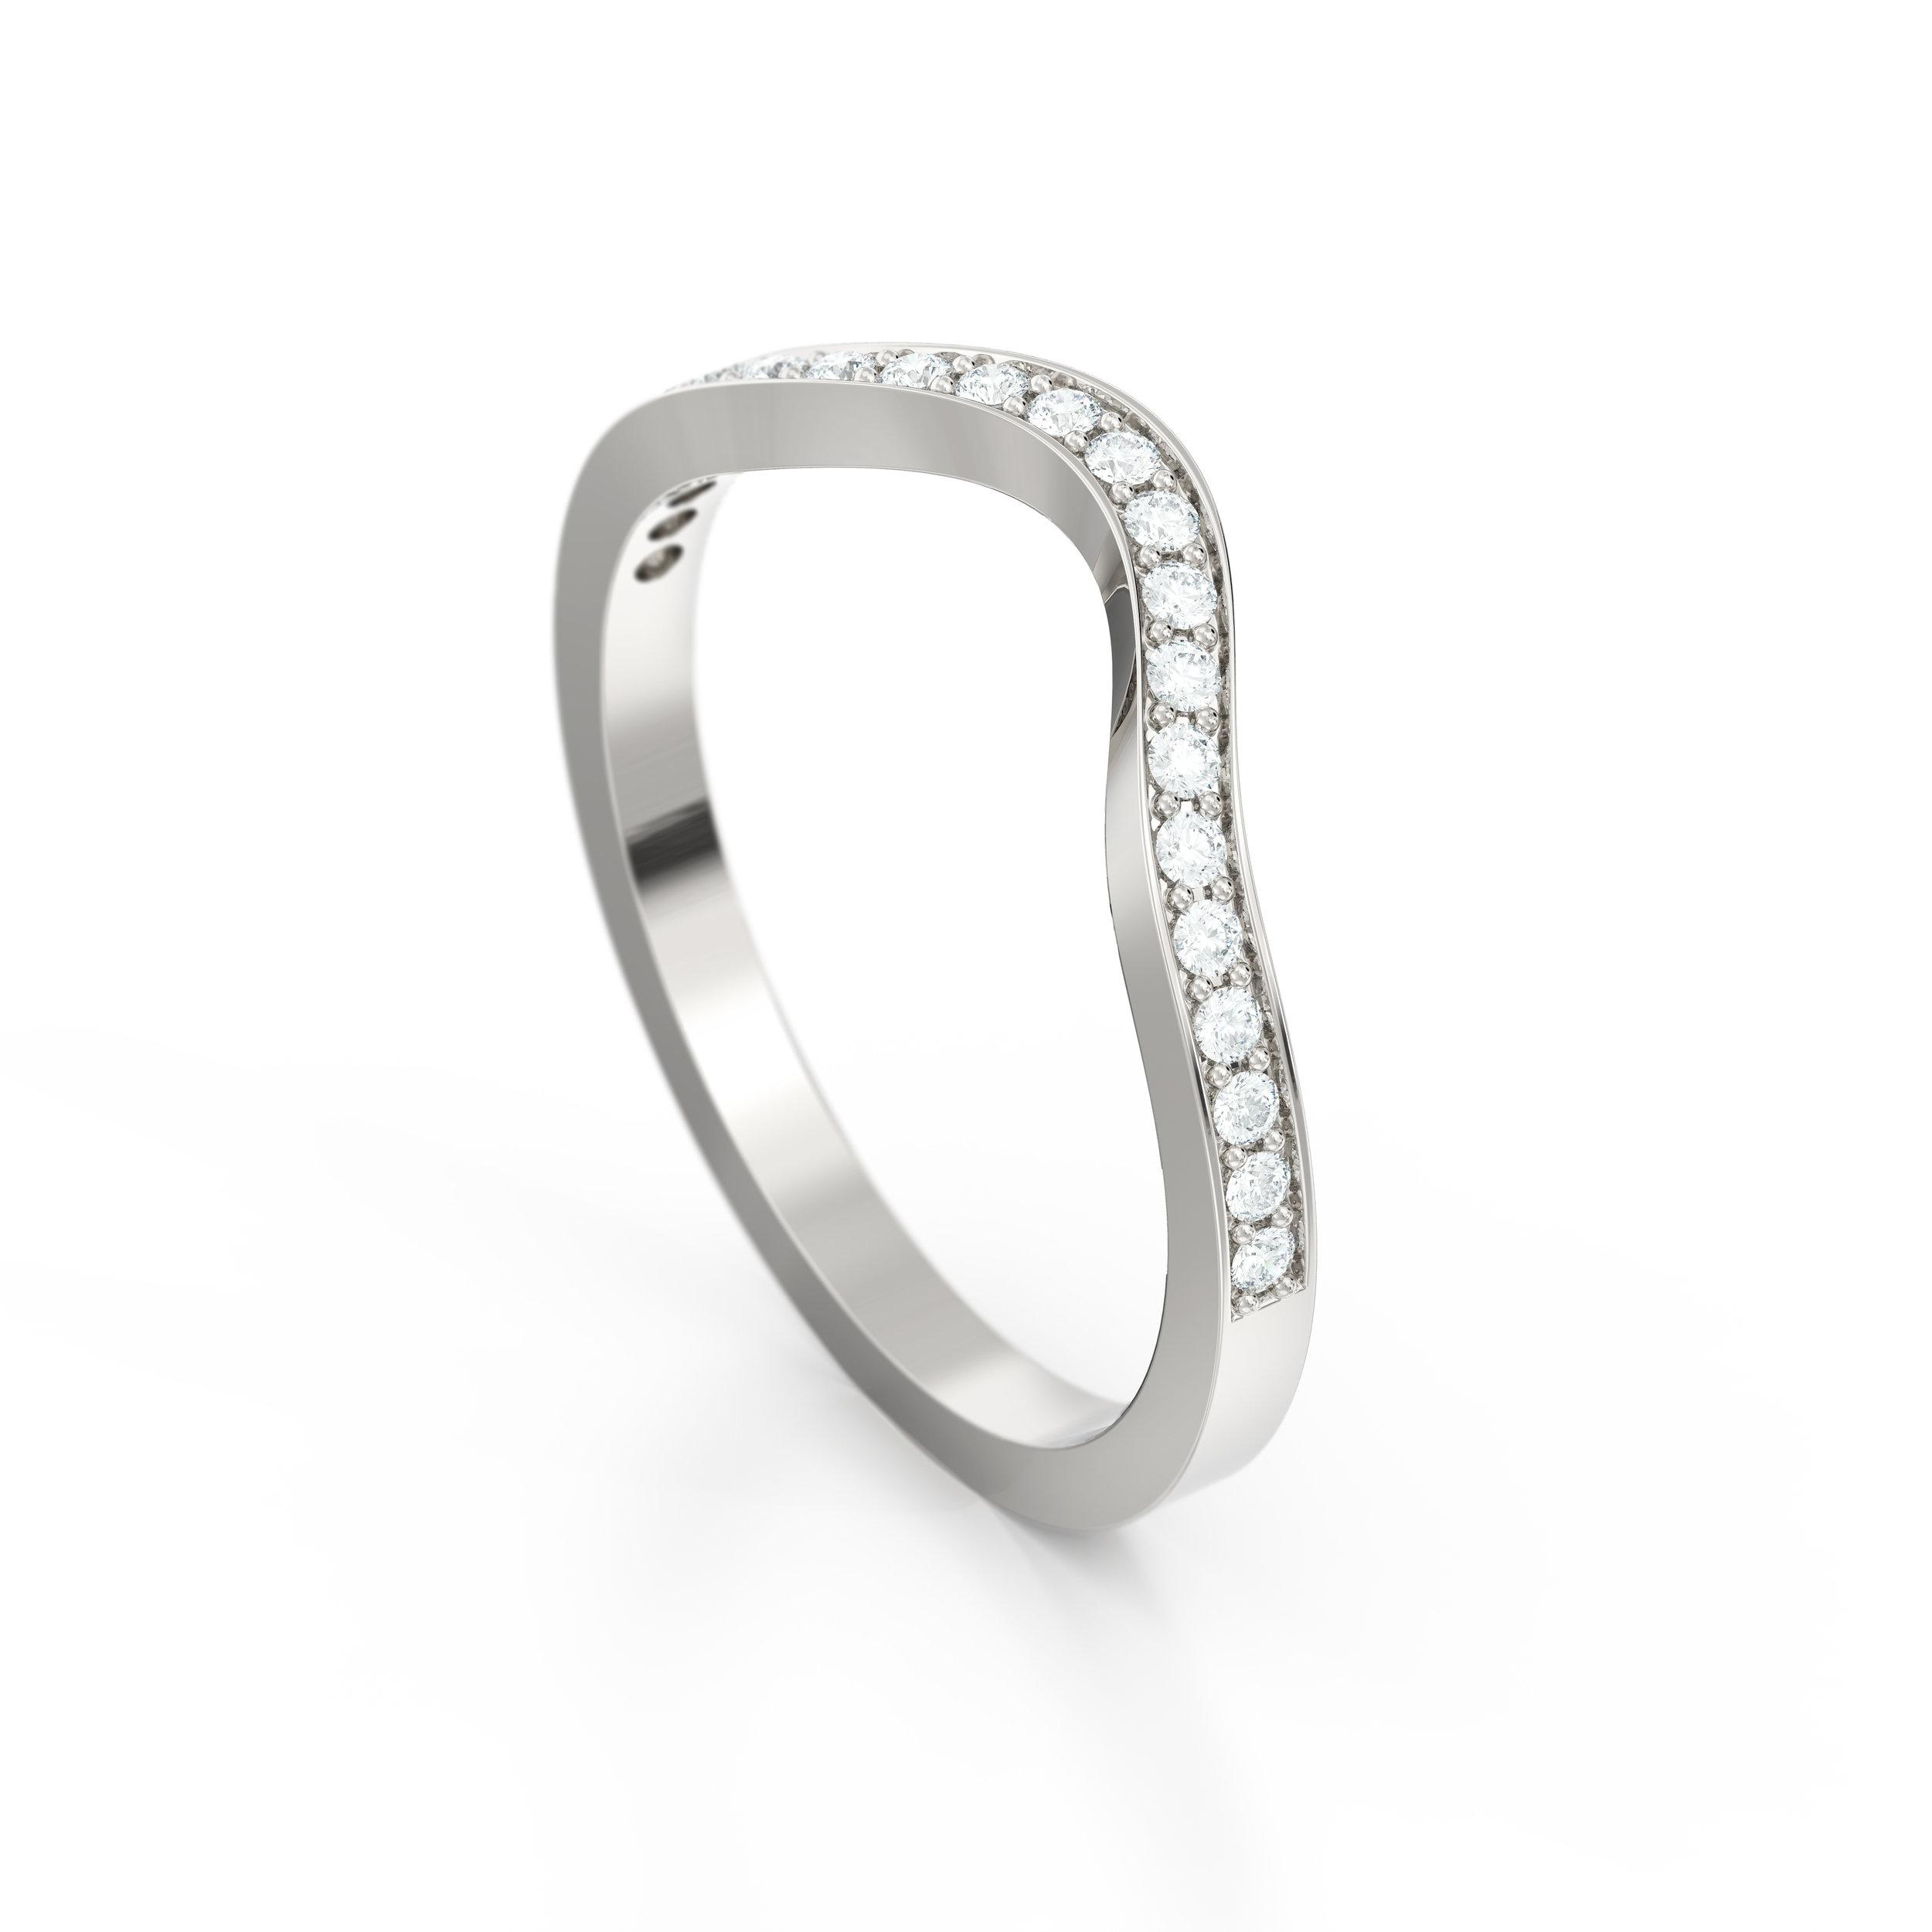 Horse shoe pave set diamond eternity ring